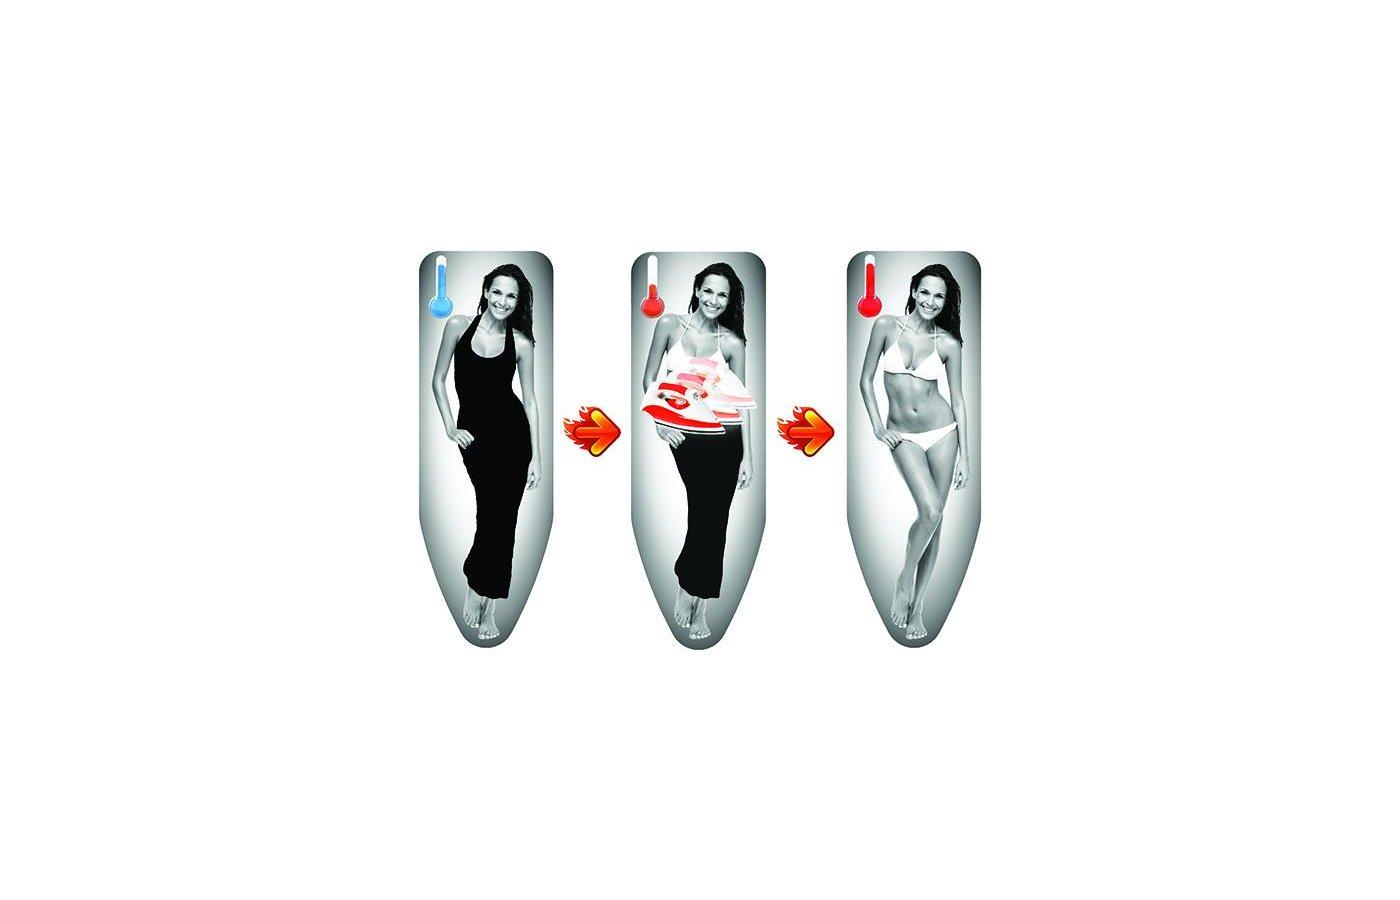 Чехлы и принадлежности для глажки Colombo Чехол д/гл.доски с терморисунком Girl 140х55см